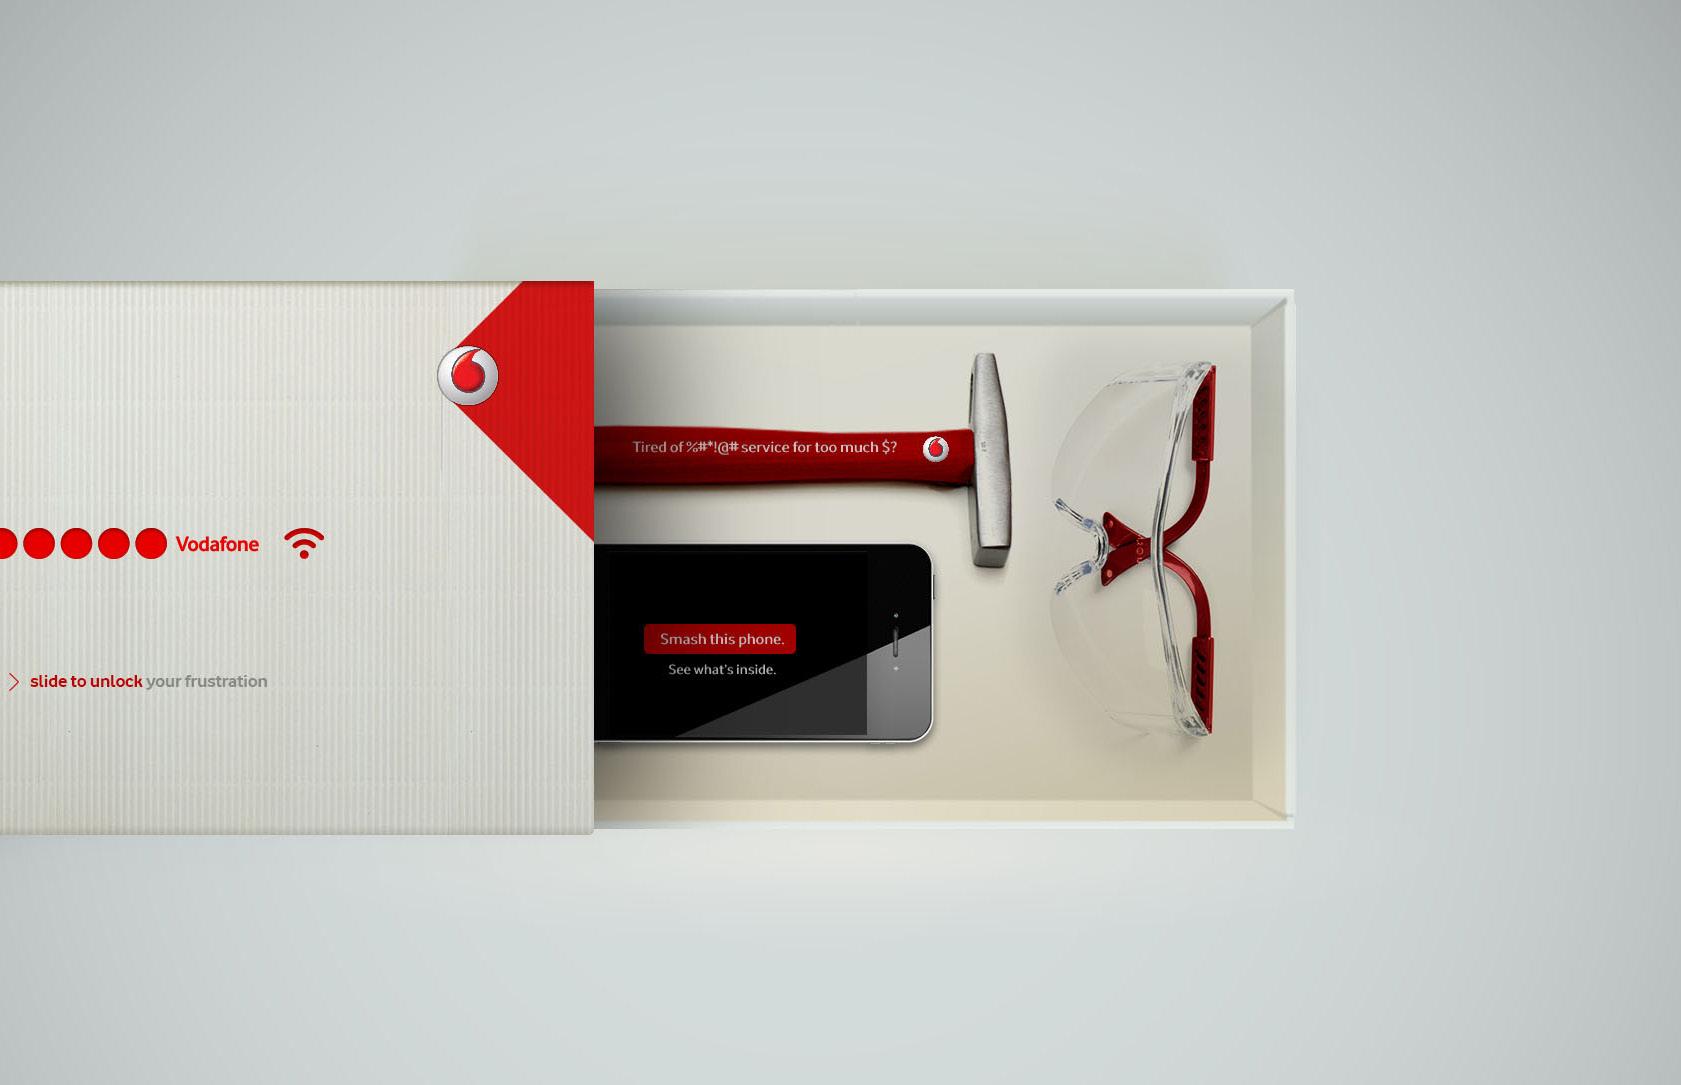 Web_Vodafone_Page_09.jpg